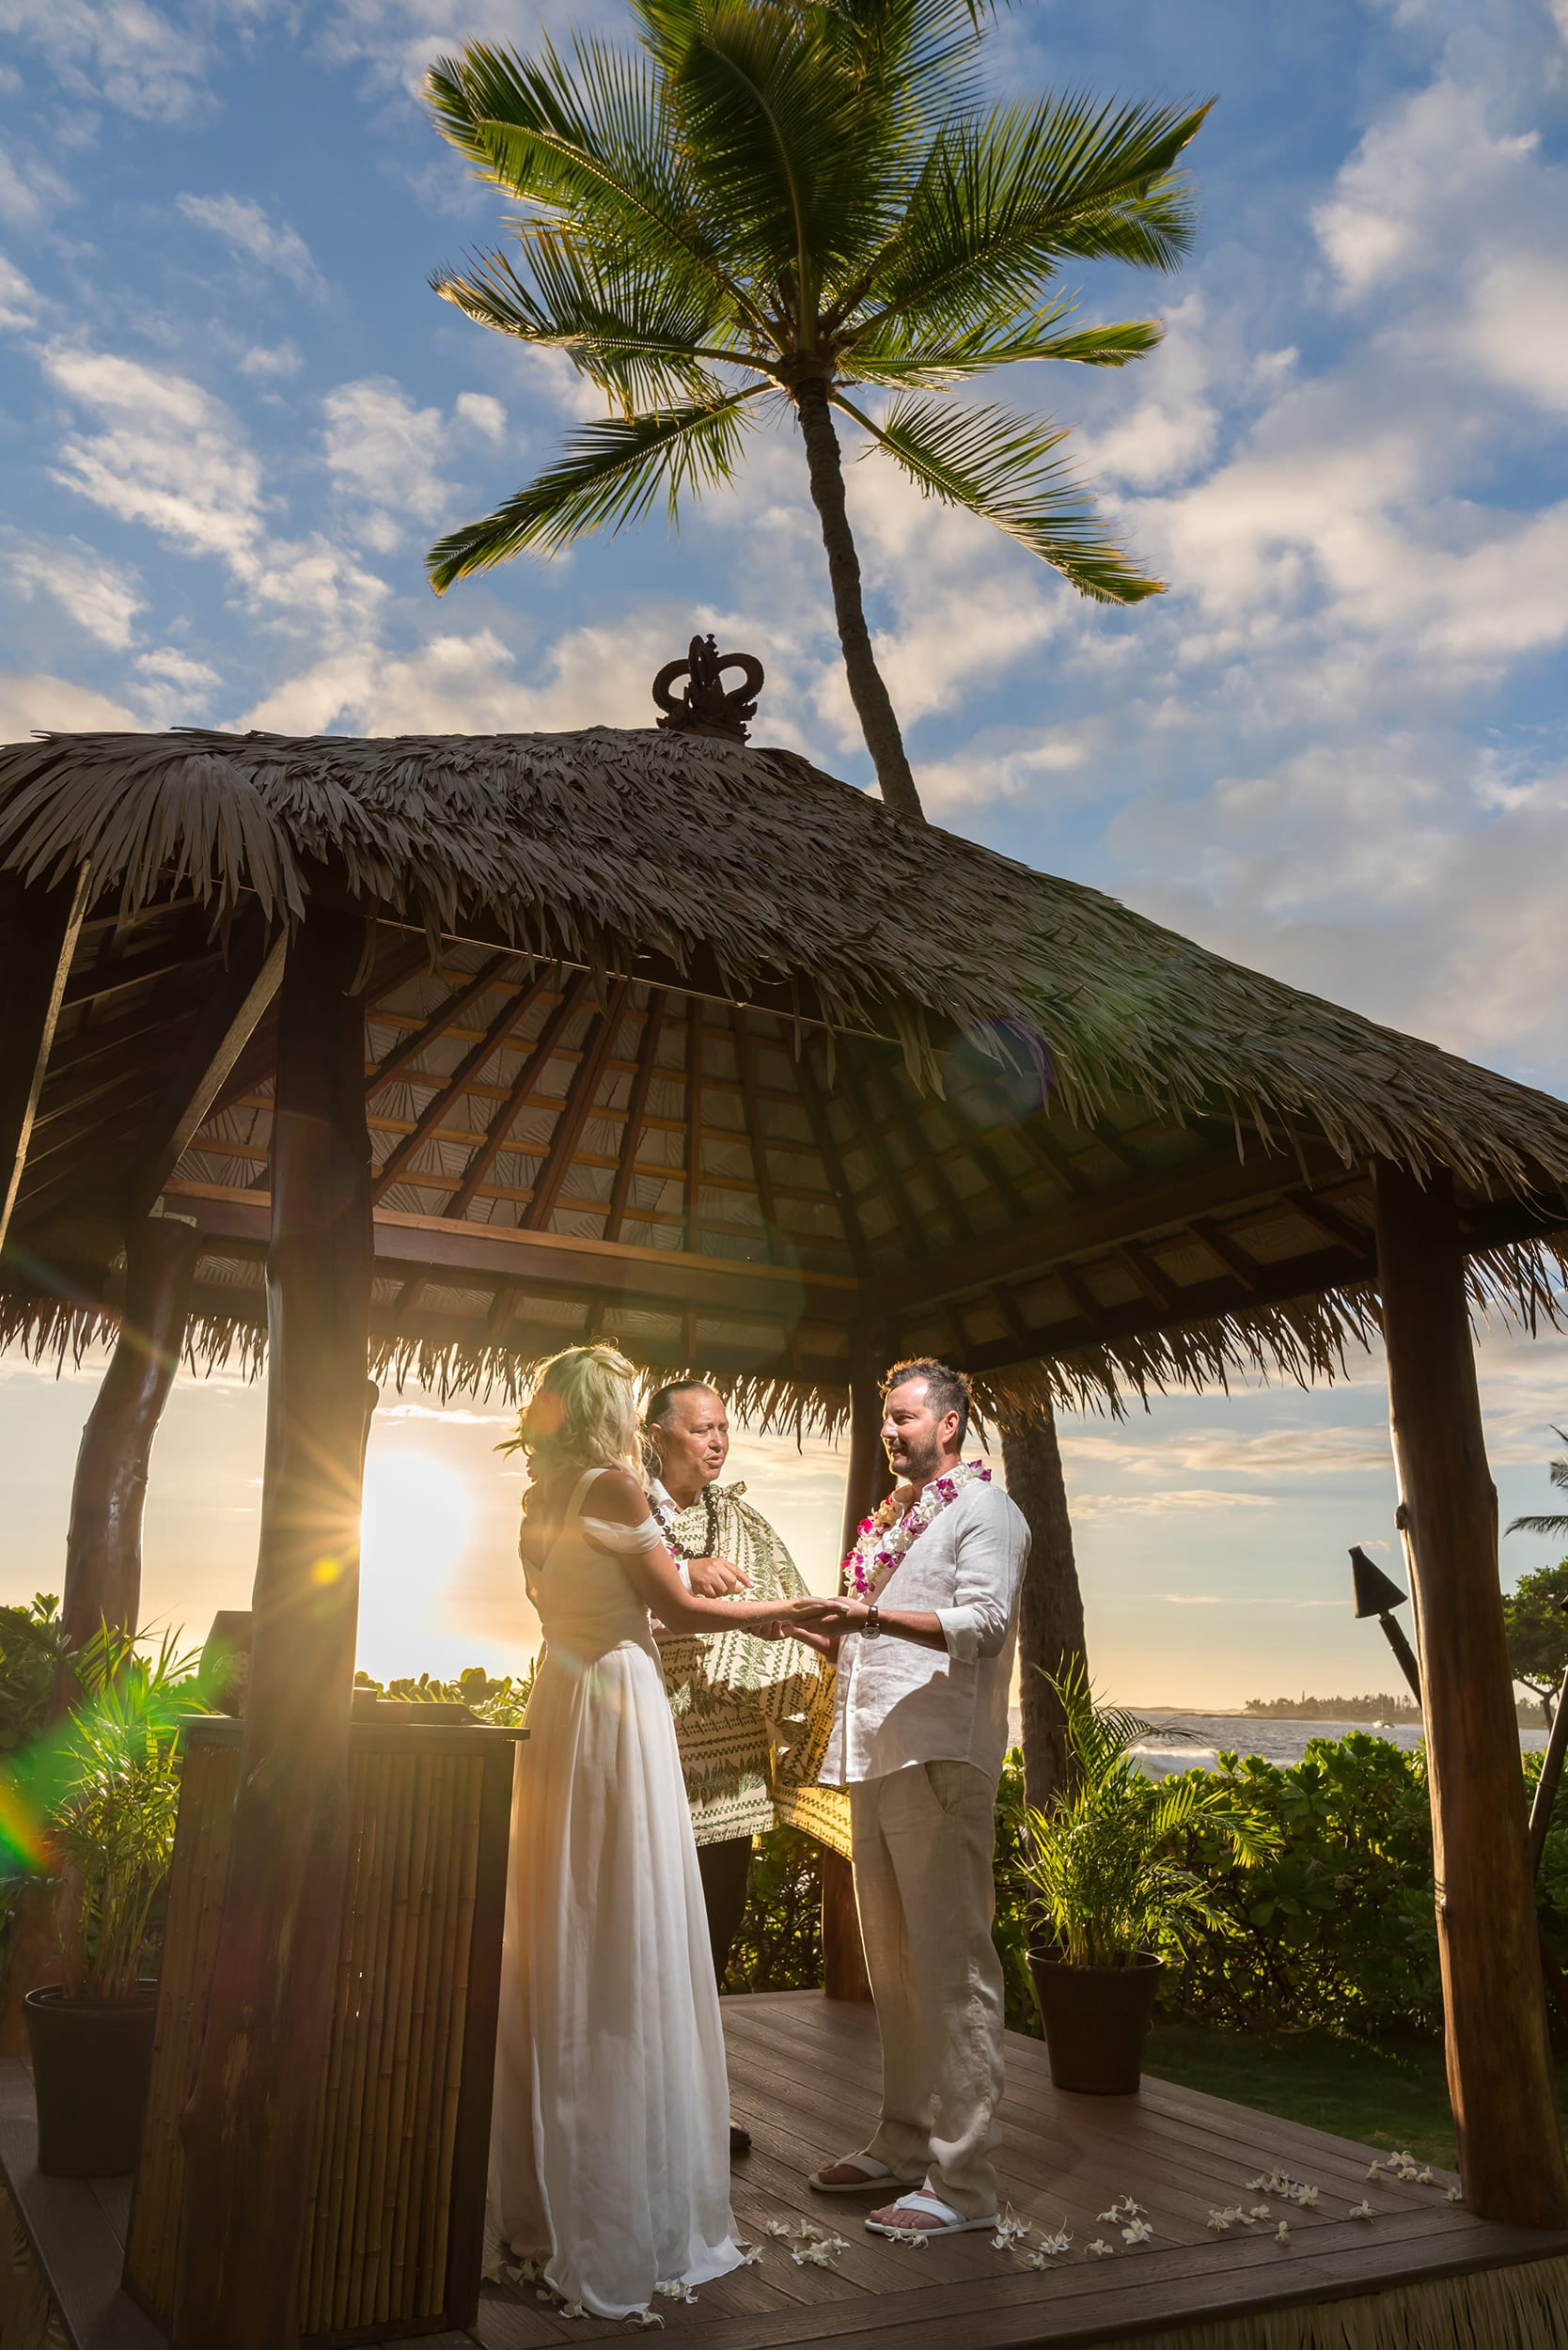 Roya-Kona-Resort-Elopement-Elzbieta-Piotr-hawaii-photographer7.jpg